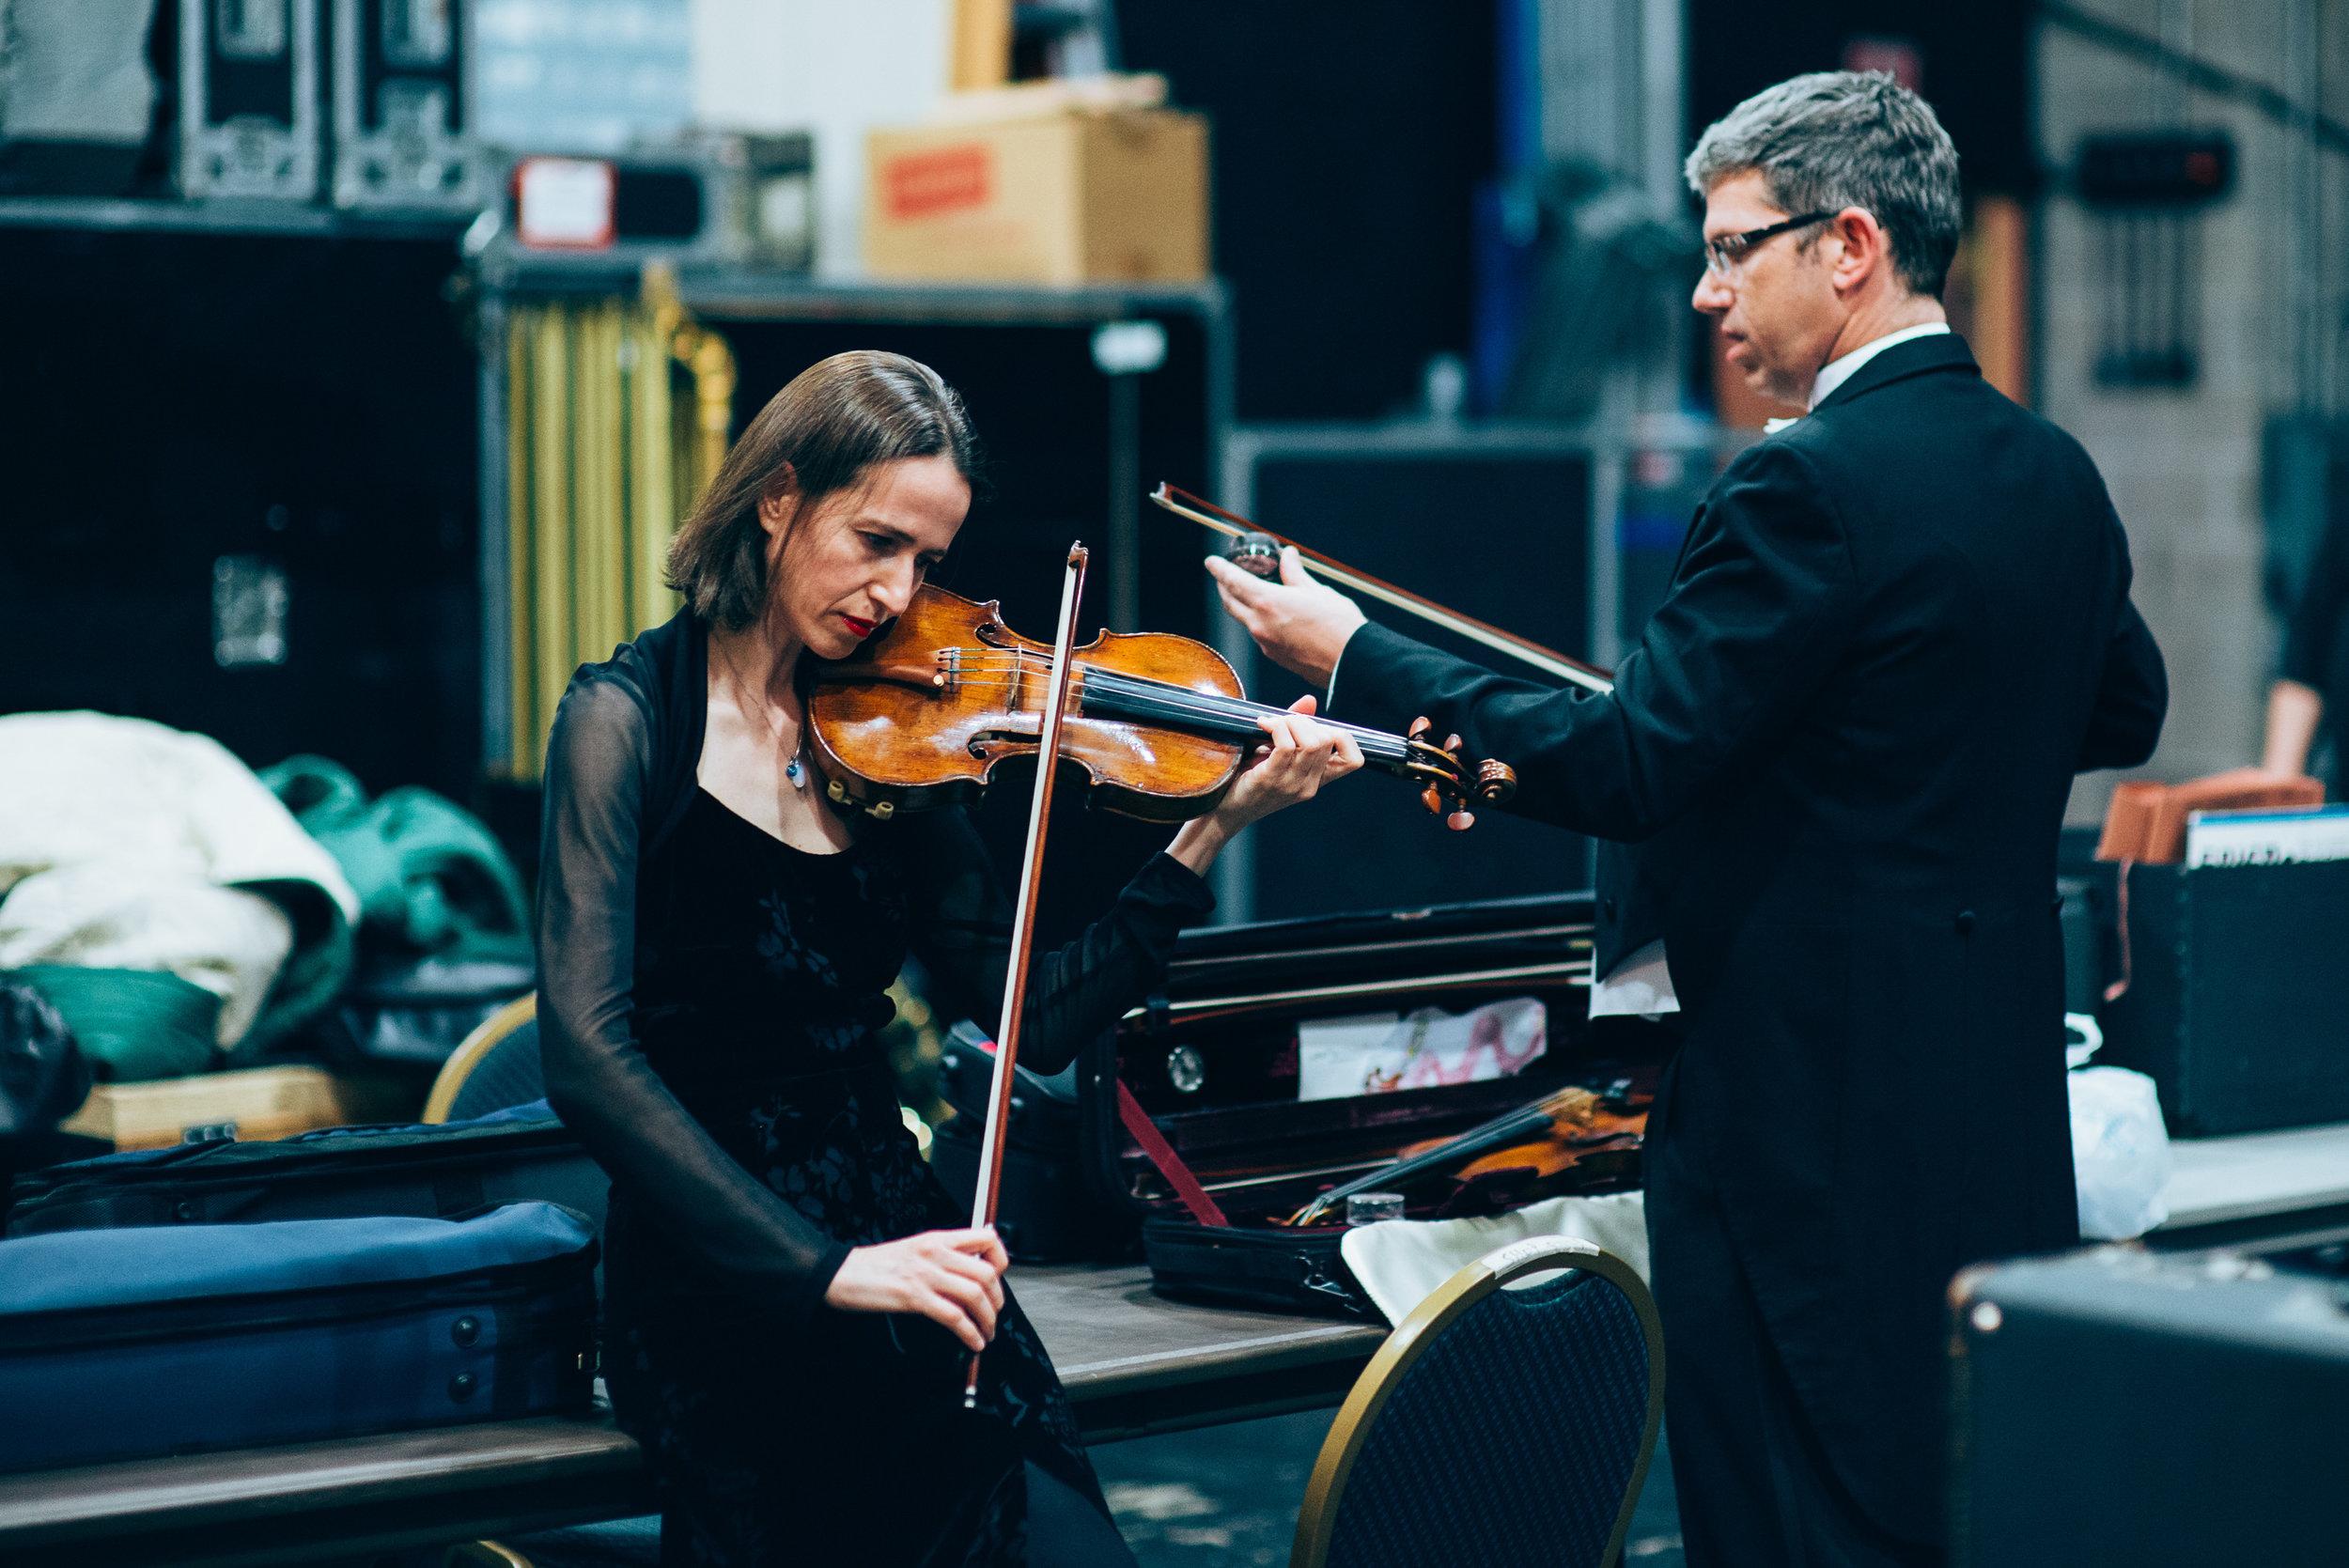 Rossitza Goza, Tulsa Symphony Orchestra Concertmaster practicing backstage